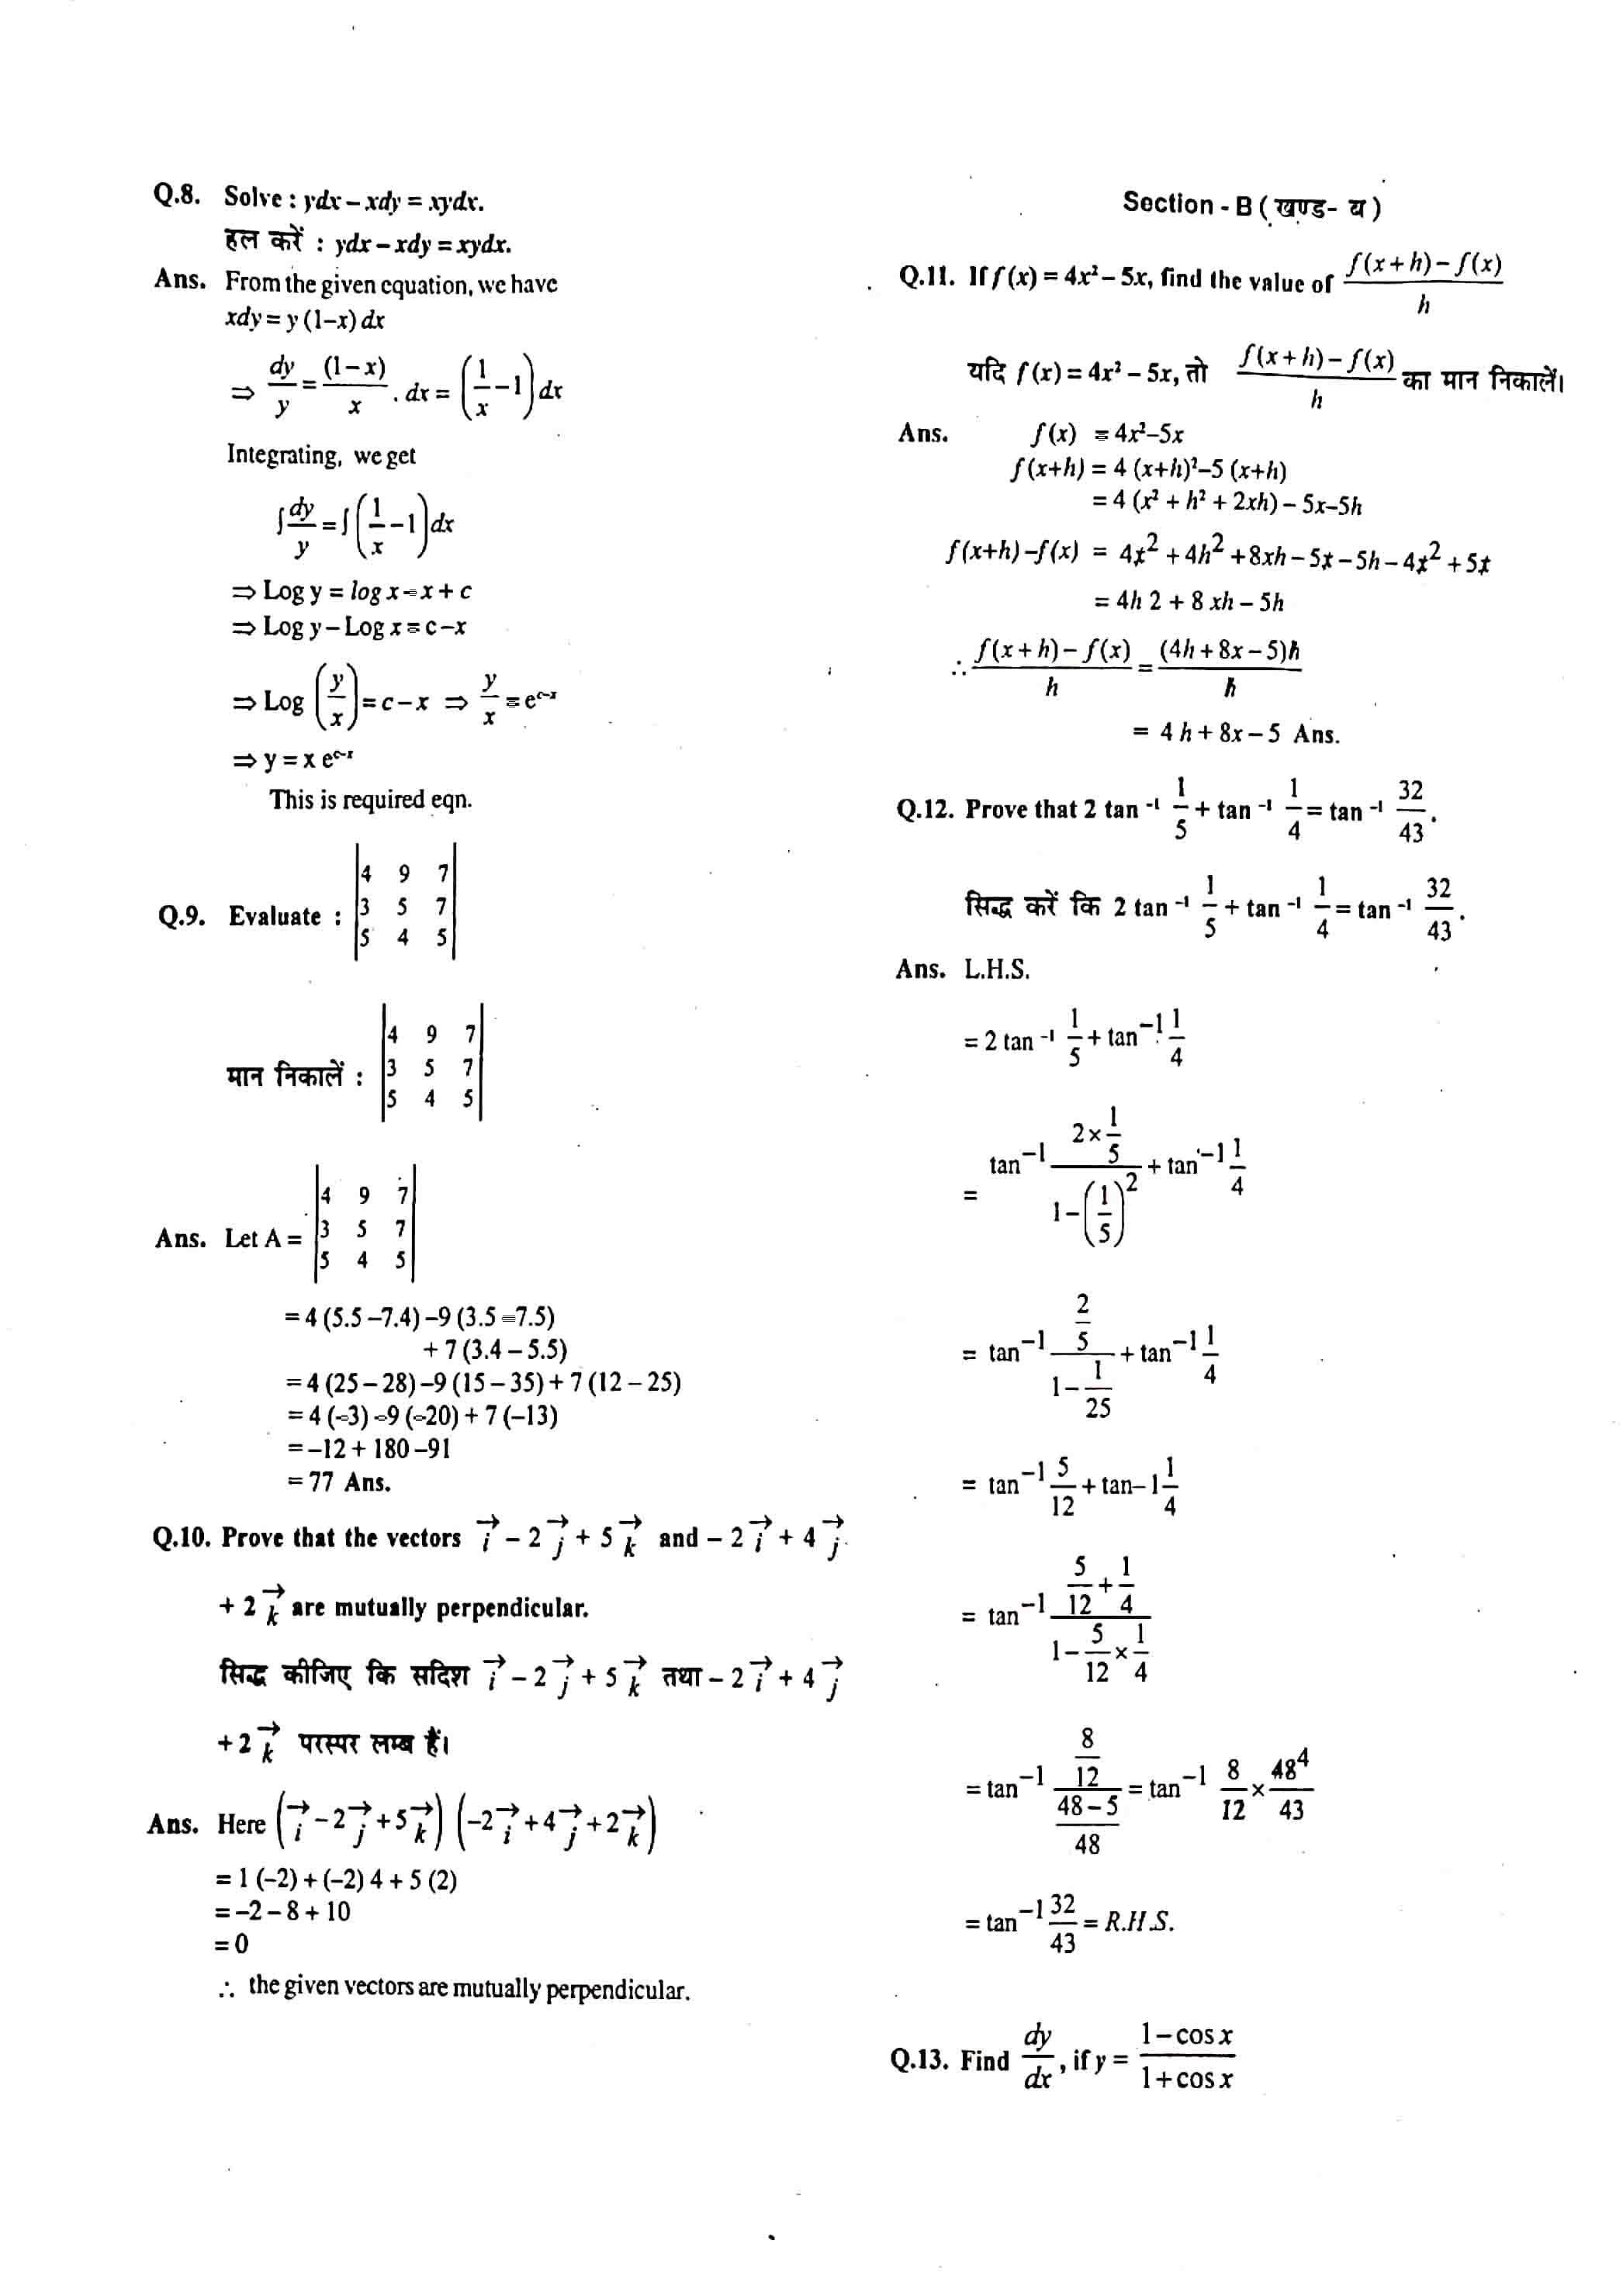 JAC Class 12 math 2013 Question Paper 02